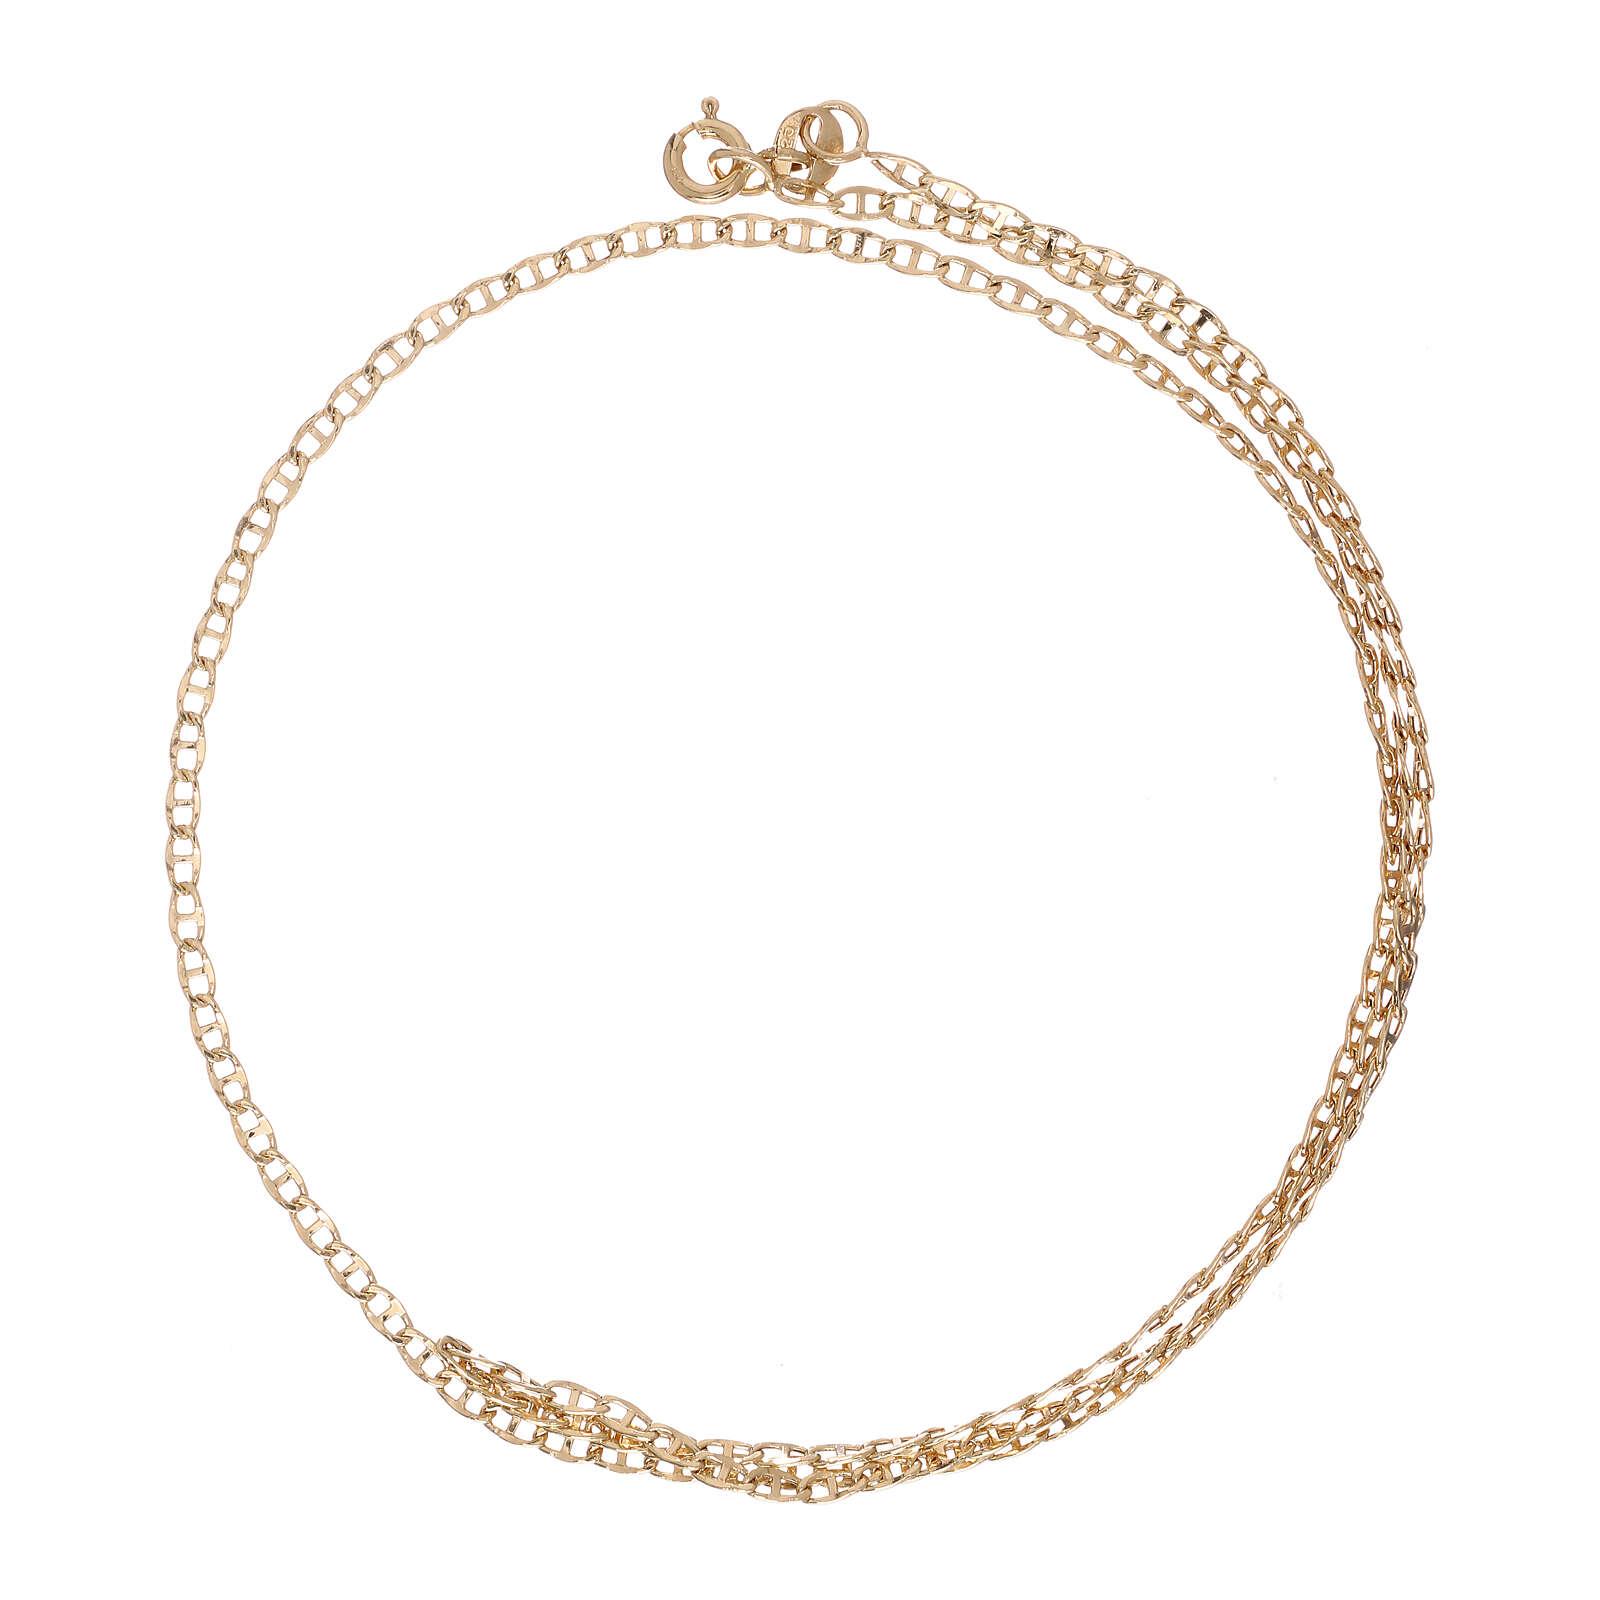 Mariner chain 18-carat yellow gold 19 3/4 in 4